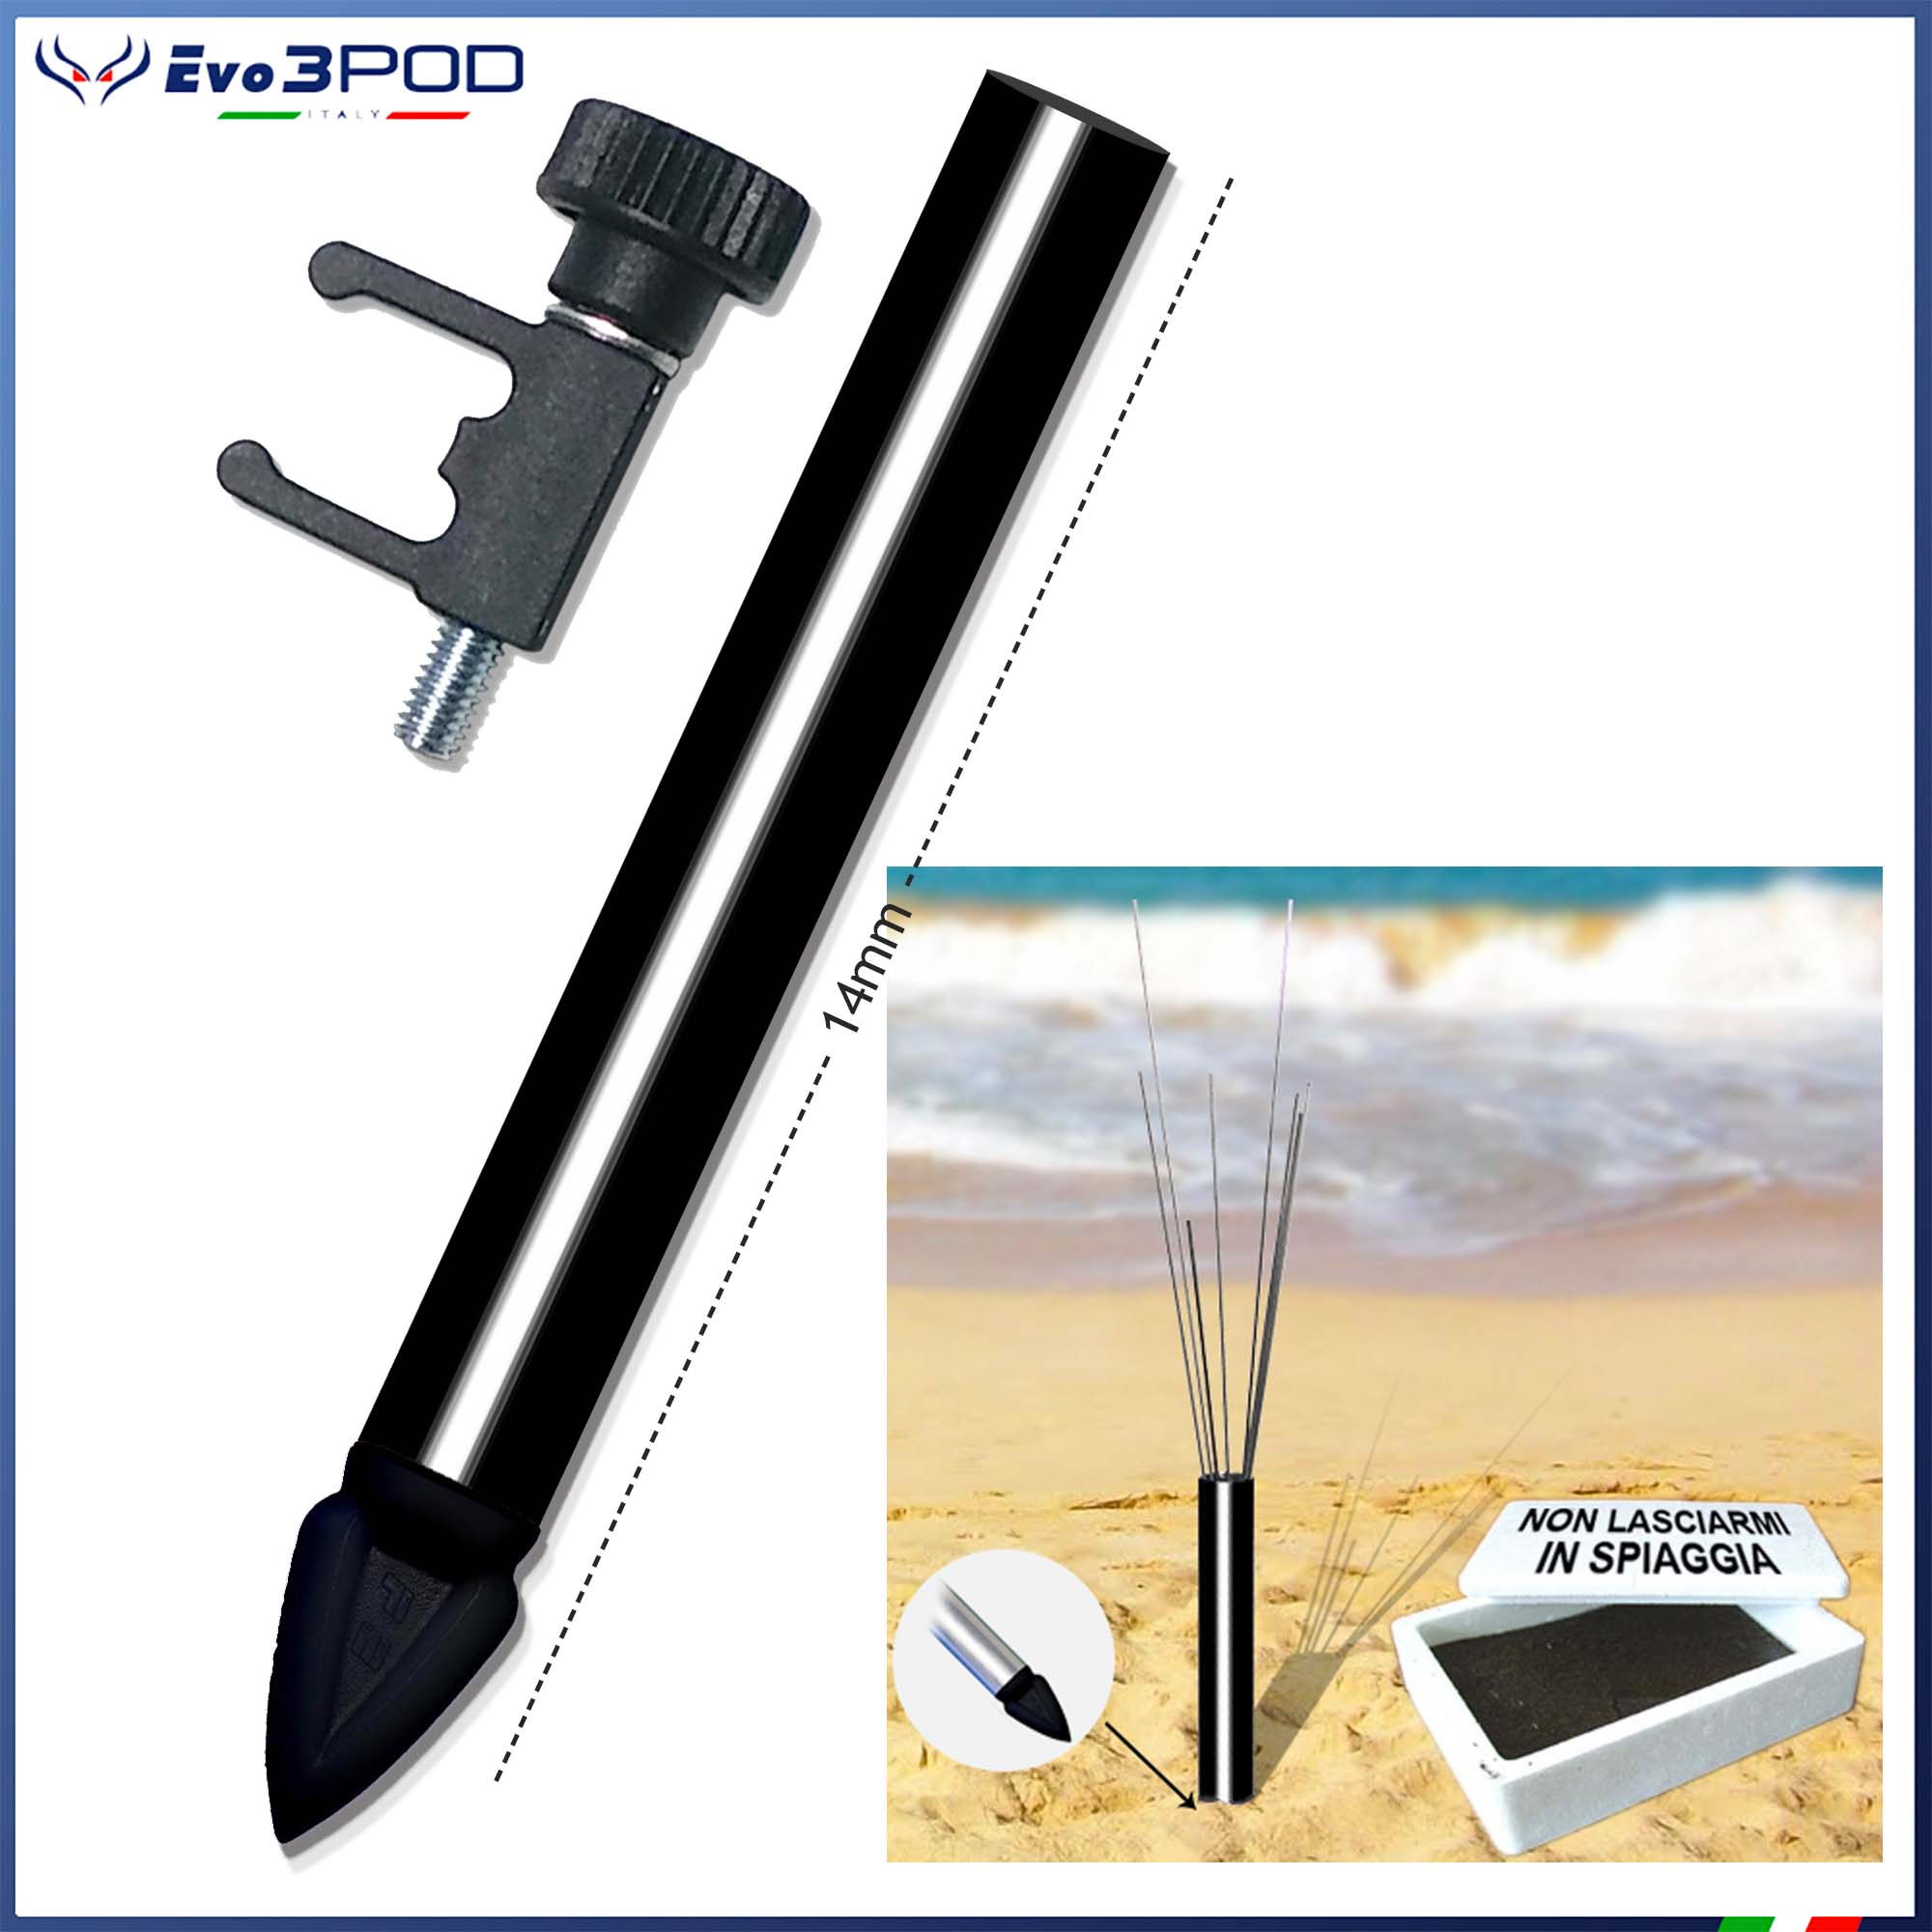 evo3pod-porta-aghi-alluminio-clip-basic_4074_6.jpg